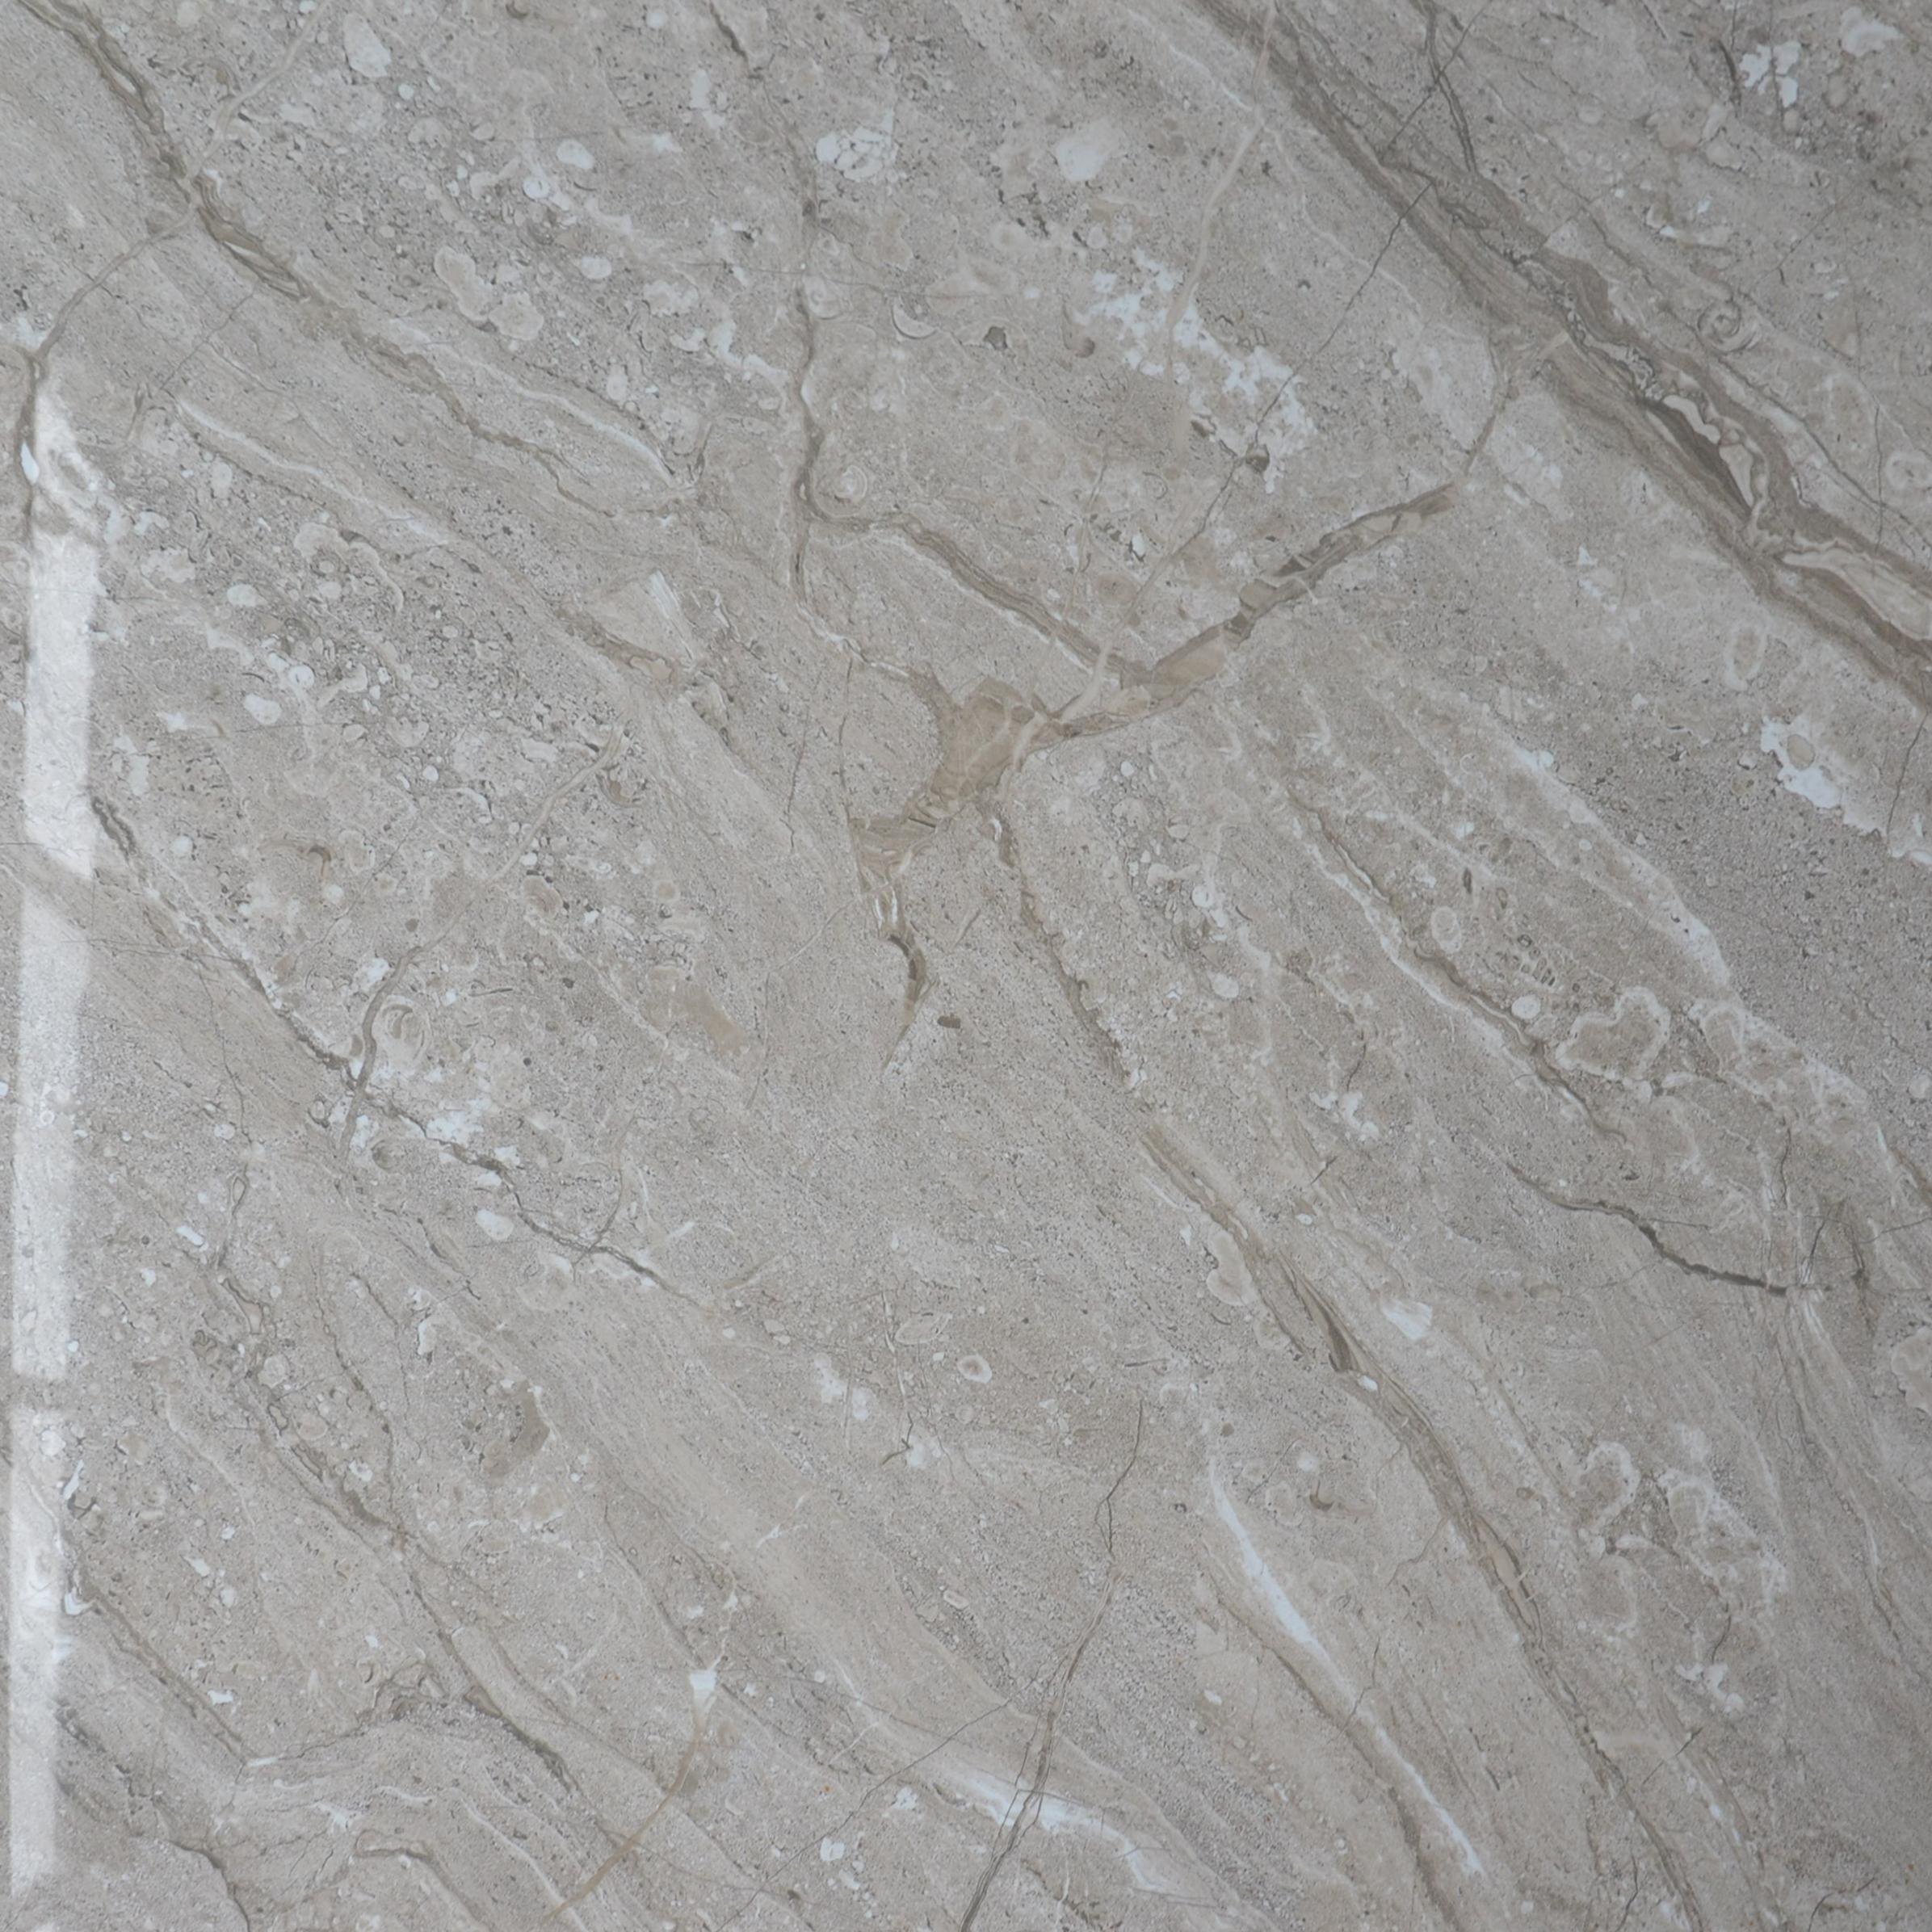 HB6452 fabriek in china porselein keuken kajaria verglaasd vloertegels